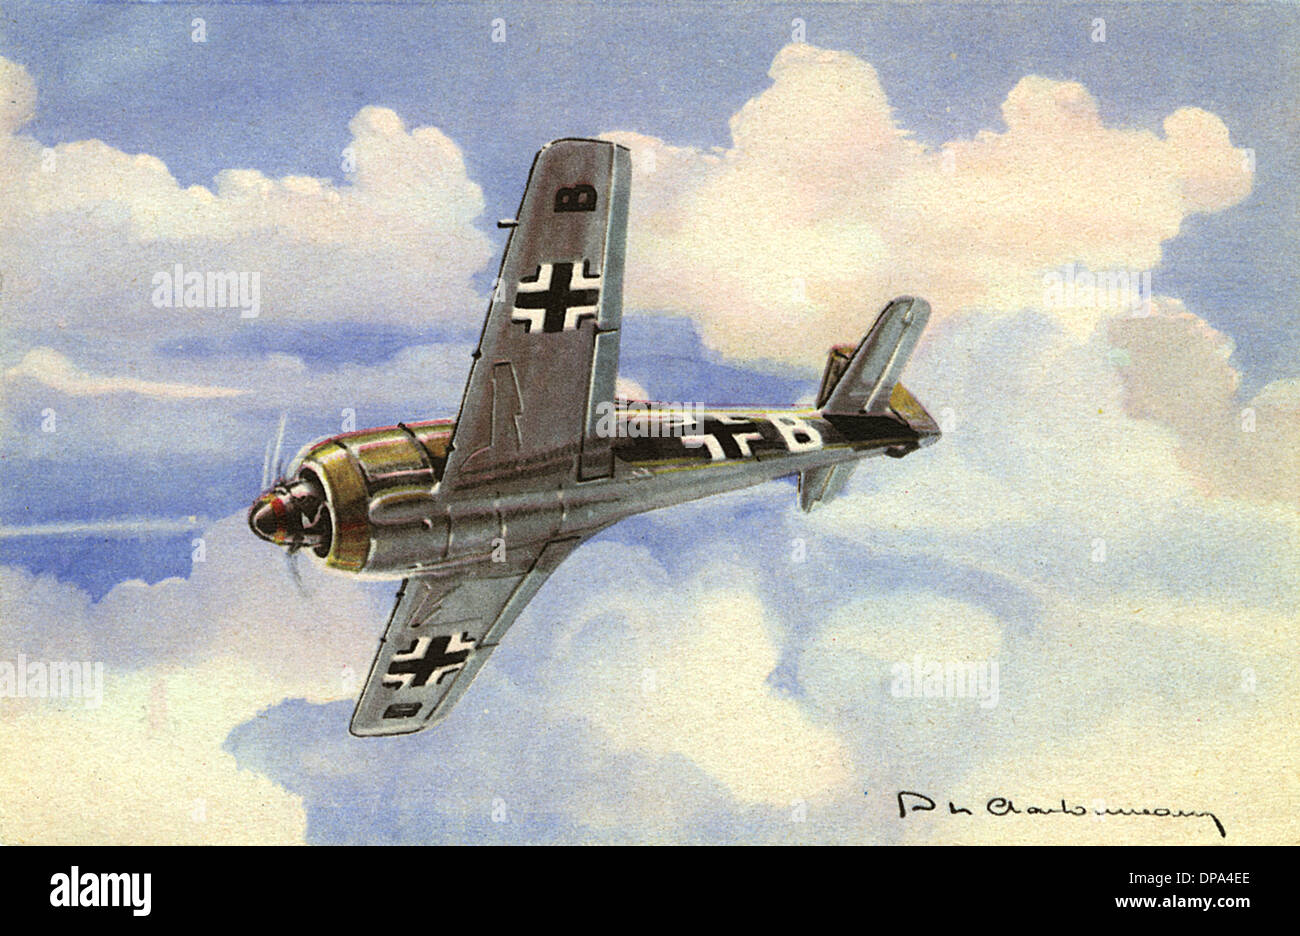 FOCKE-WULF 190 FIGHTER - Stock Image